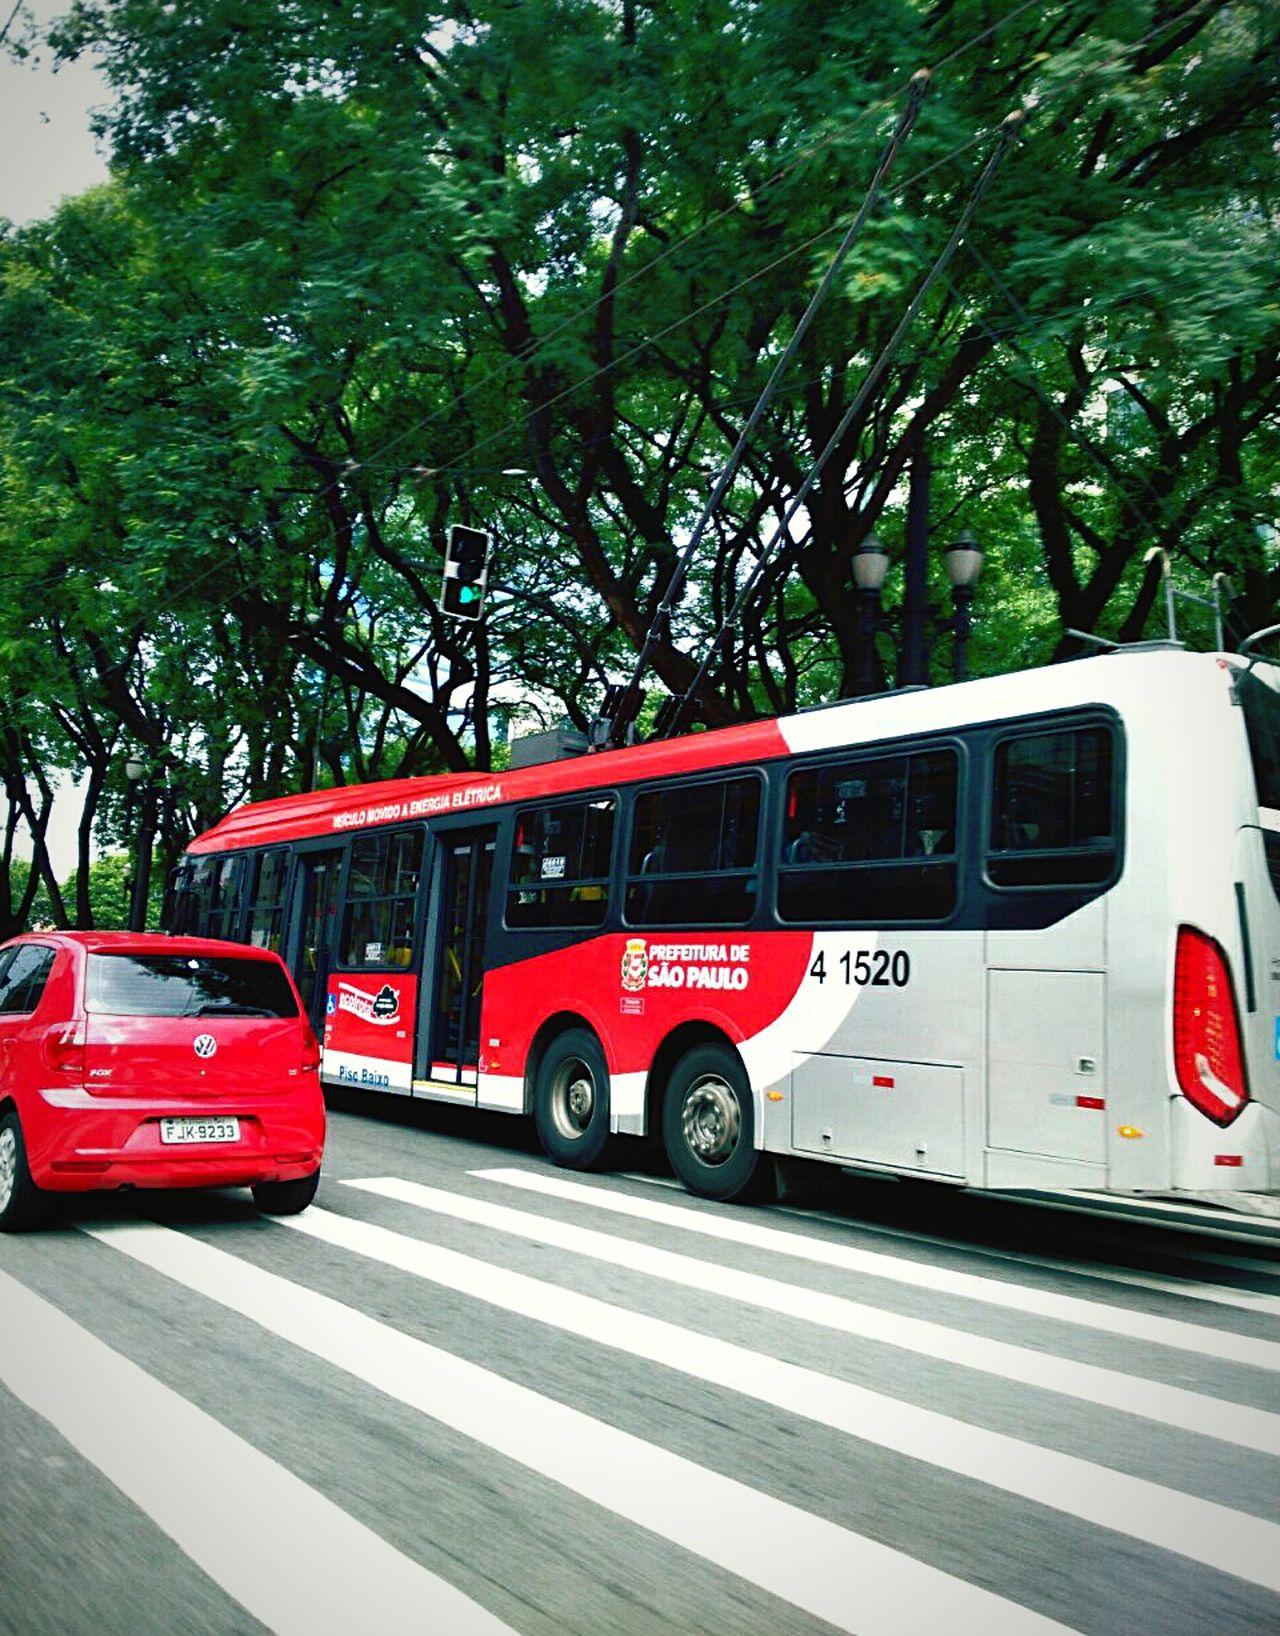 Urbanphotography Urban Life Stripes Listras Saopaulocity Sampa Sao Paulo - Brazil Adayinthelife Daybyday 🌲🏫🚶 Street Veichle Red TreesInTheCity Citylife